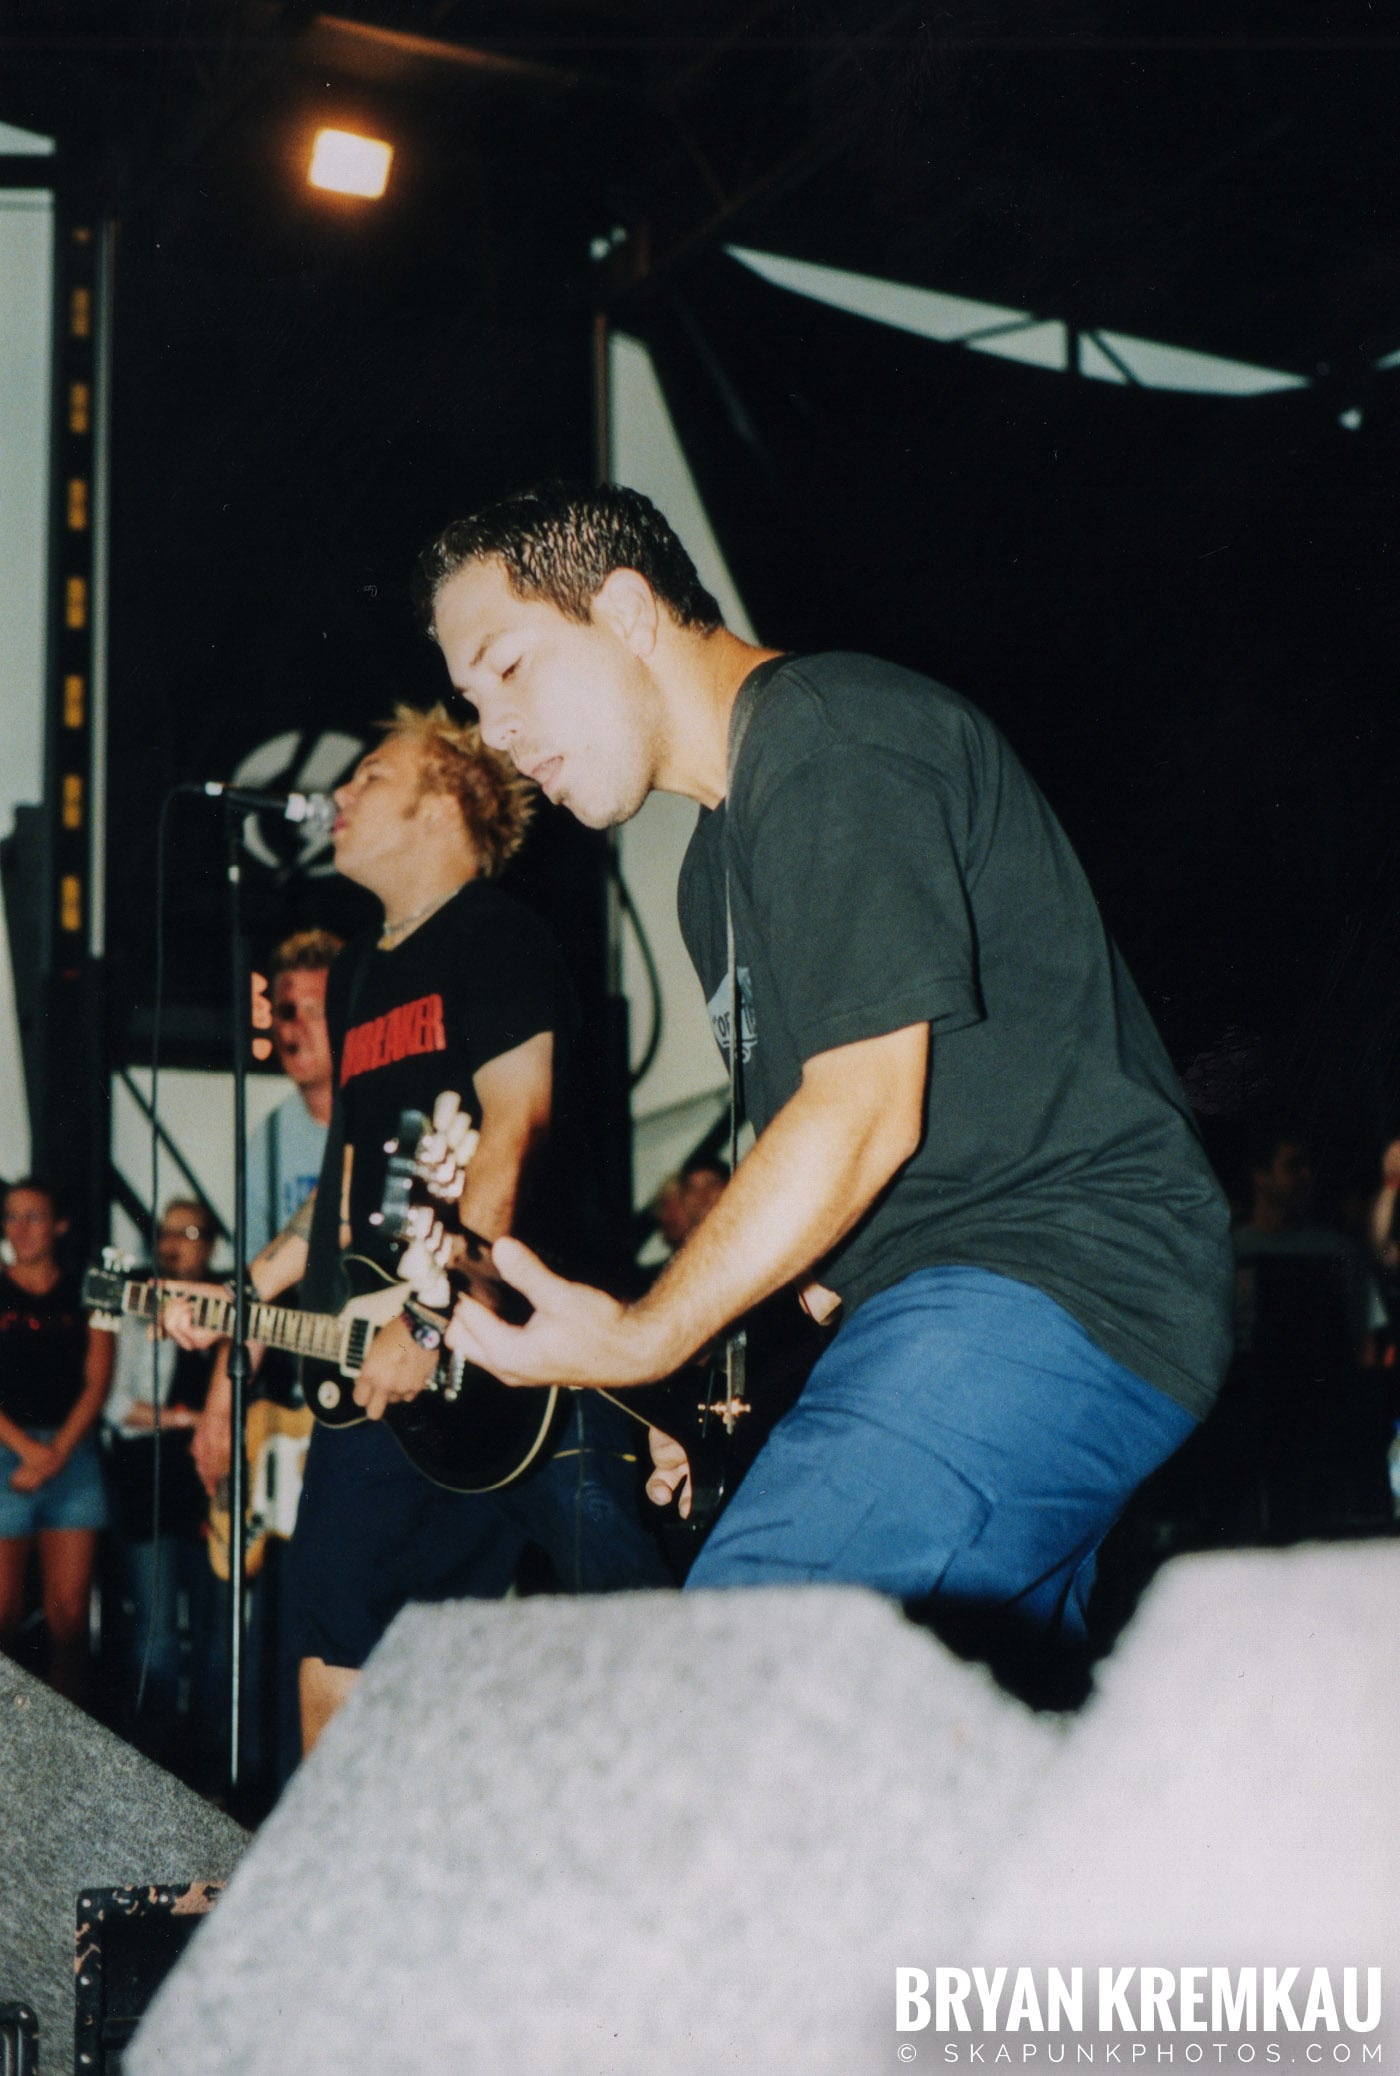 The Ataris @ Vans Warped Tour, Randall's Island, NYC - 8.4.01 (4)